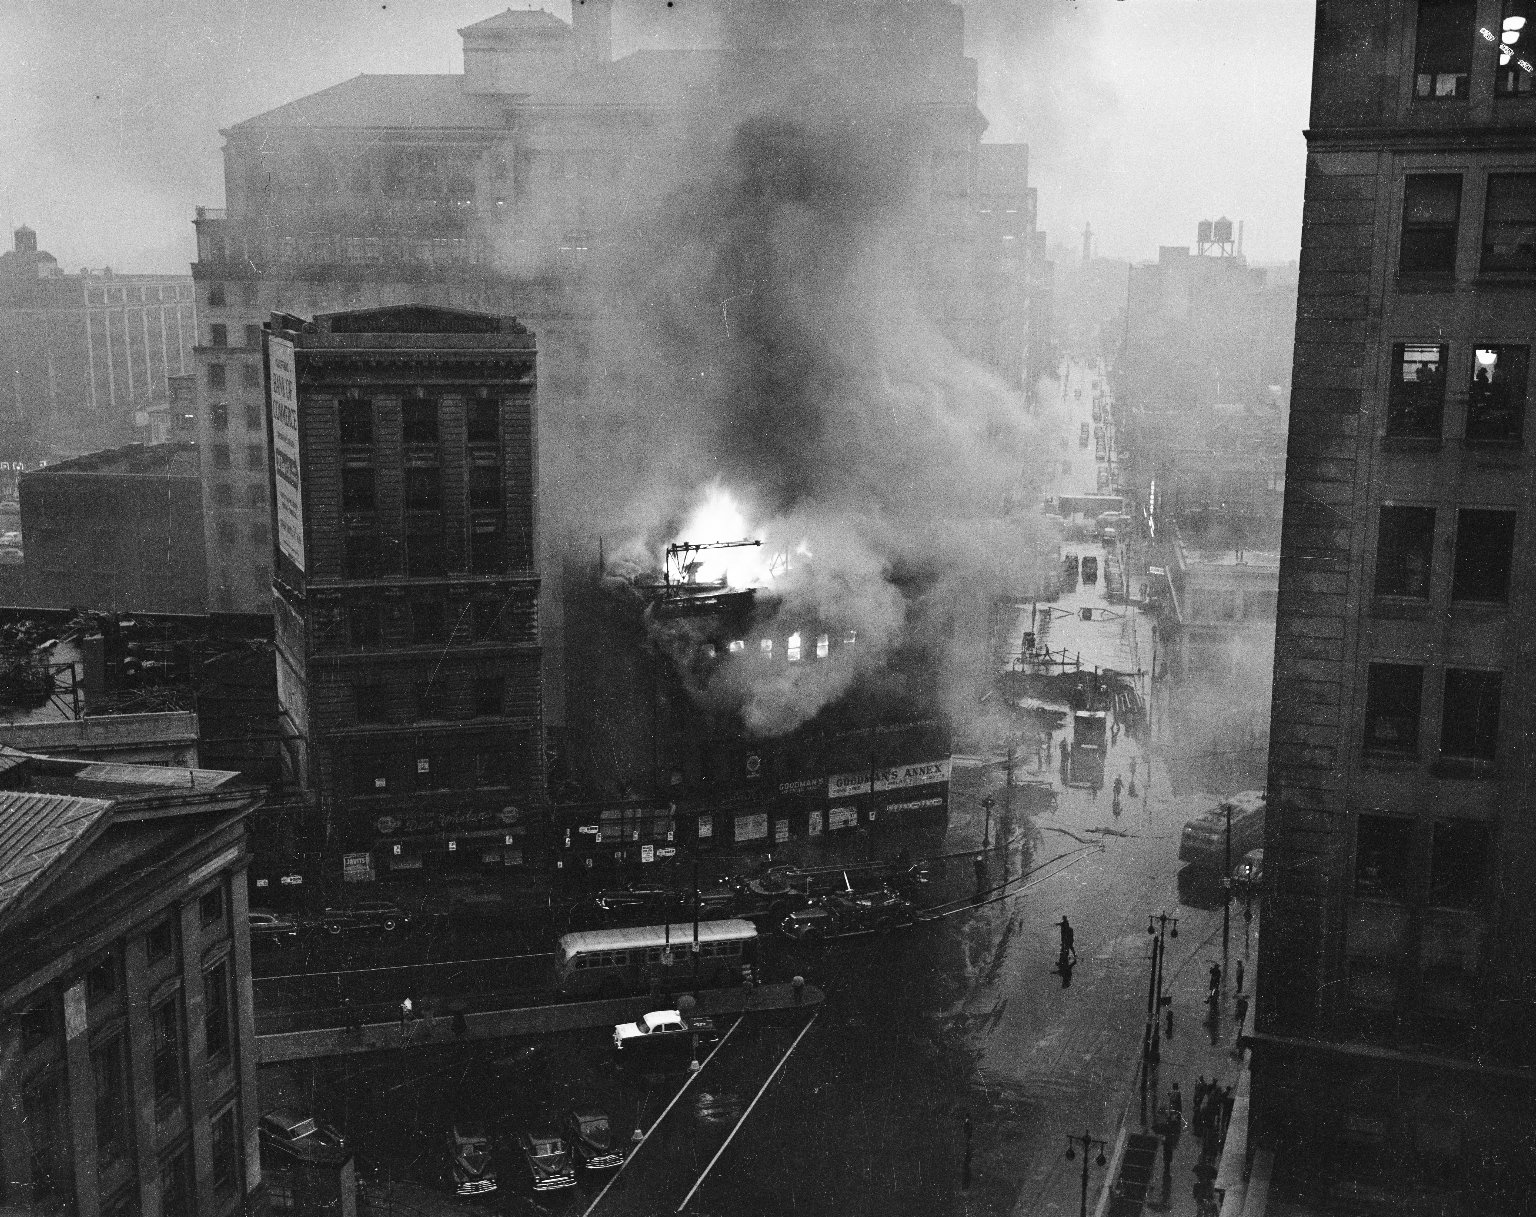 Пожар в центре Бруклина, Нью-Йорк, США. 1950-е